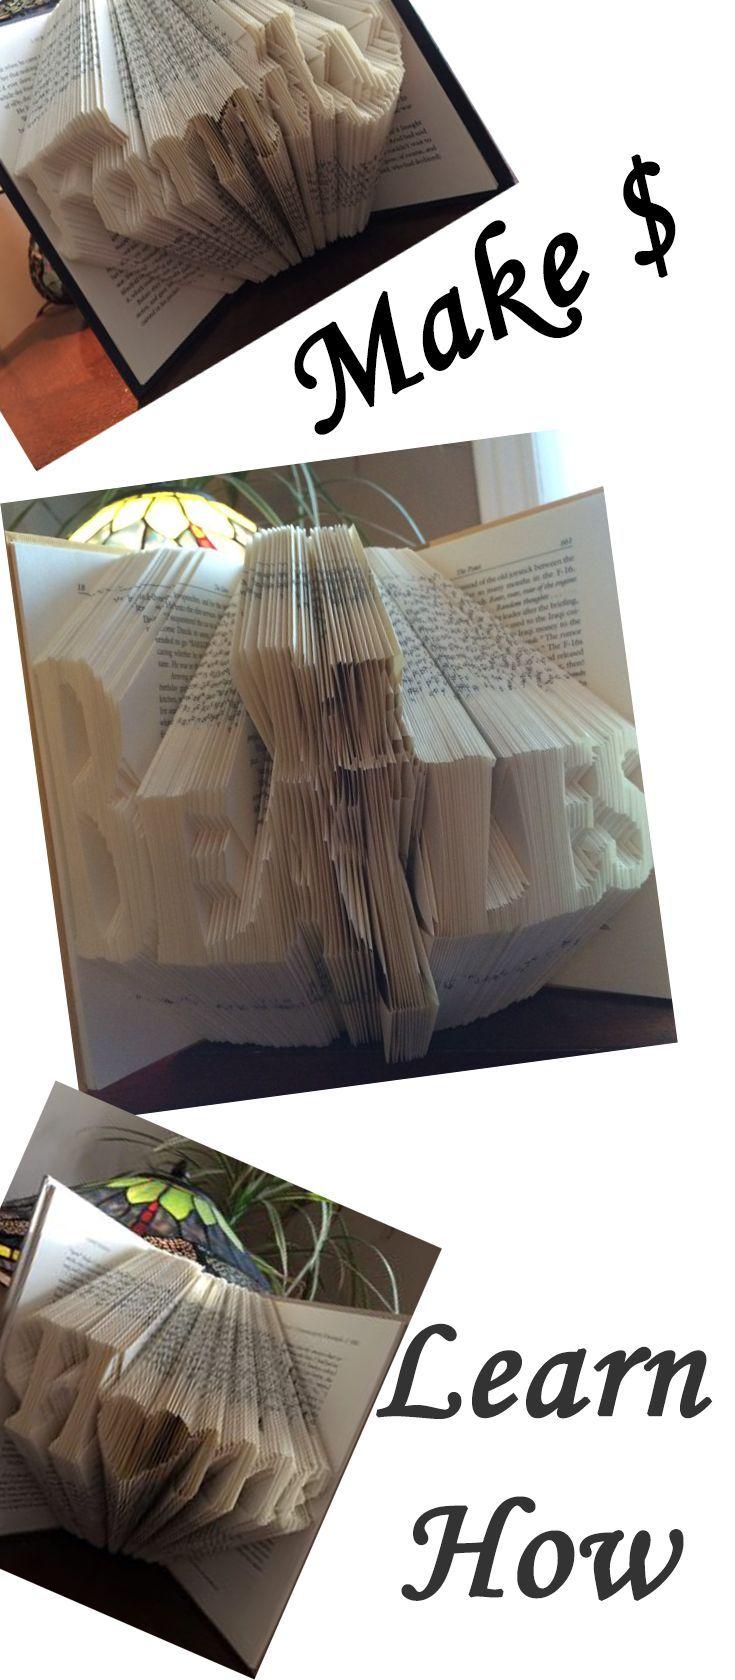 Lerne, wie man Buchkunst macht! Einfache Falttechnik mit aufgedrucktem Muster! SO …   – Top Blogs – Pinterest Viral Board